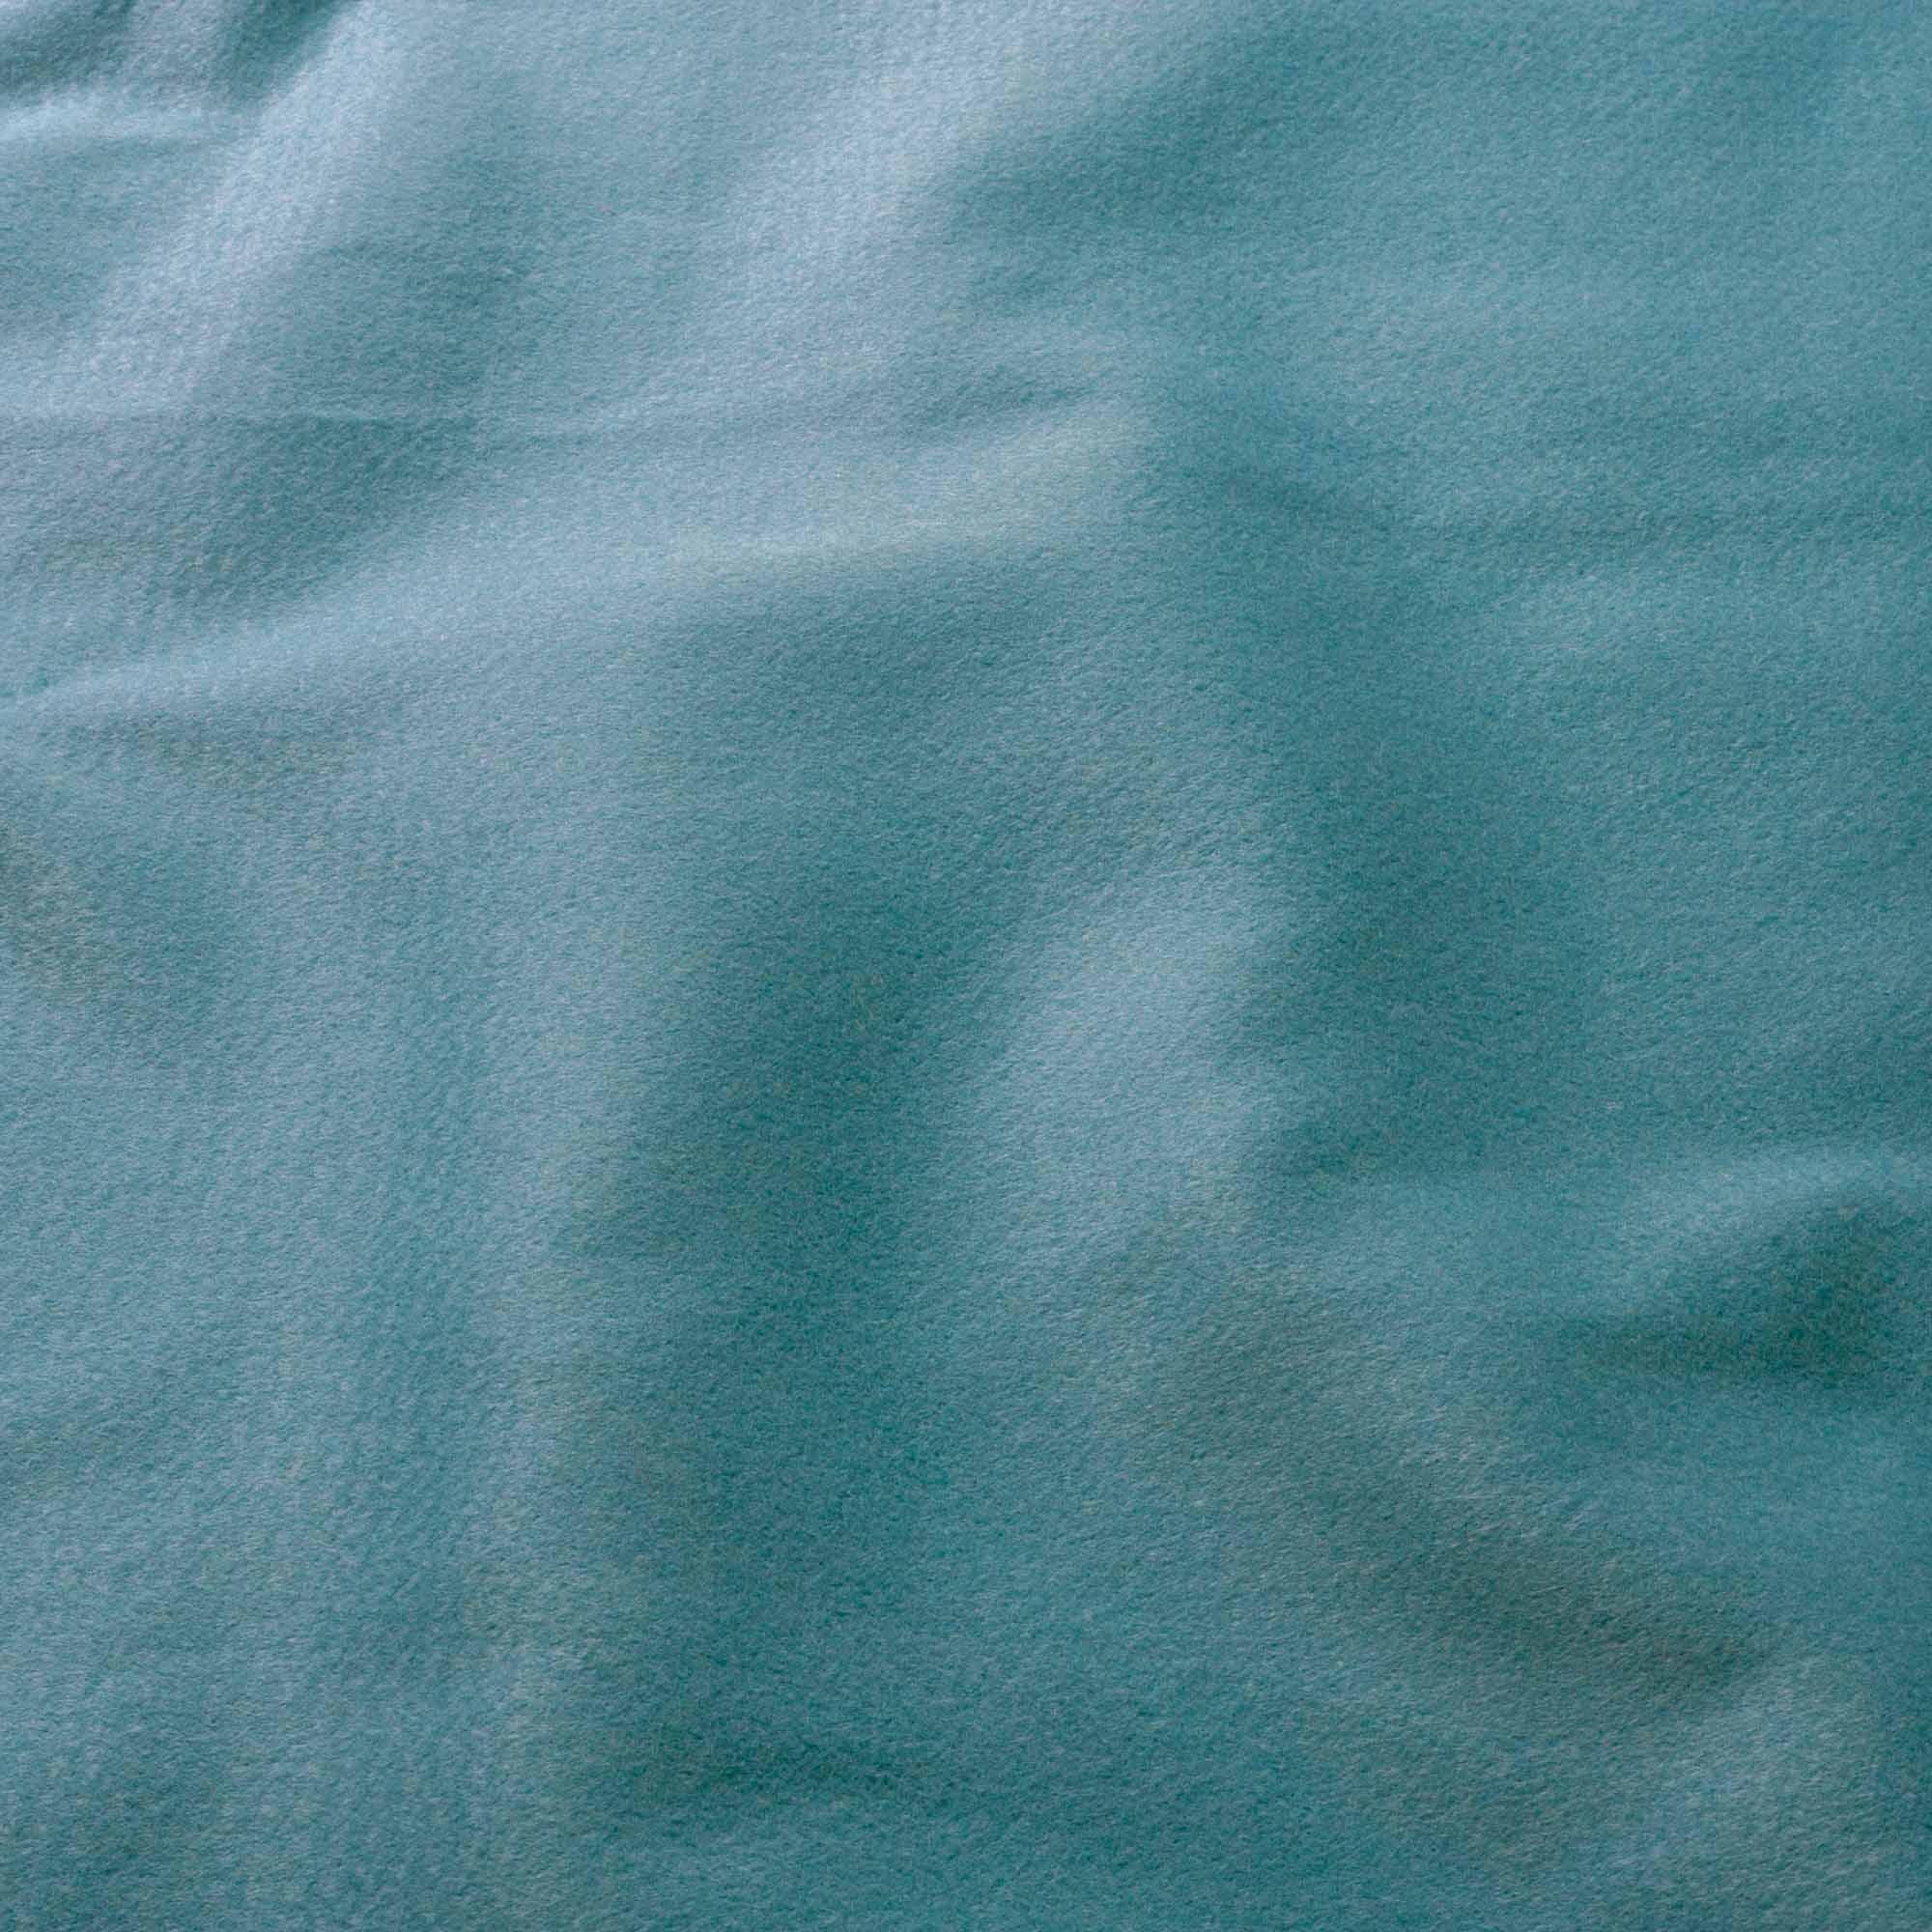 Tecido Feltro 100% Poliester 1,40 m Largura Azul Turquesa